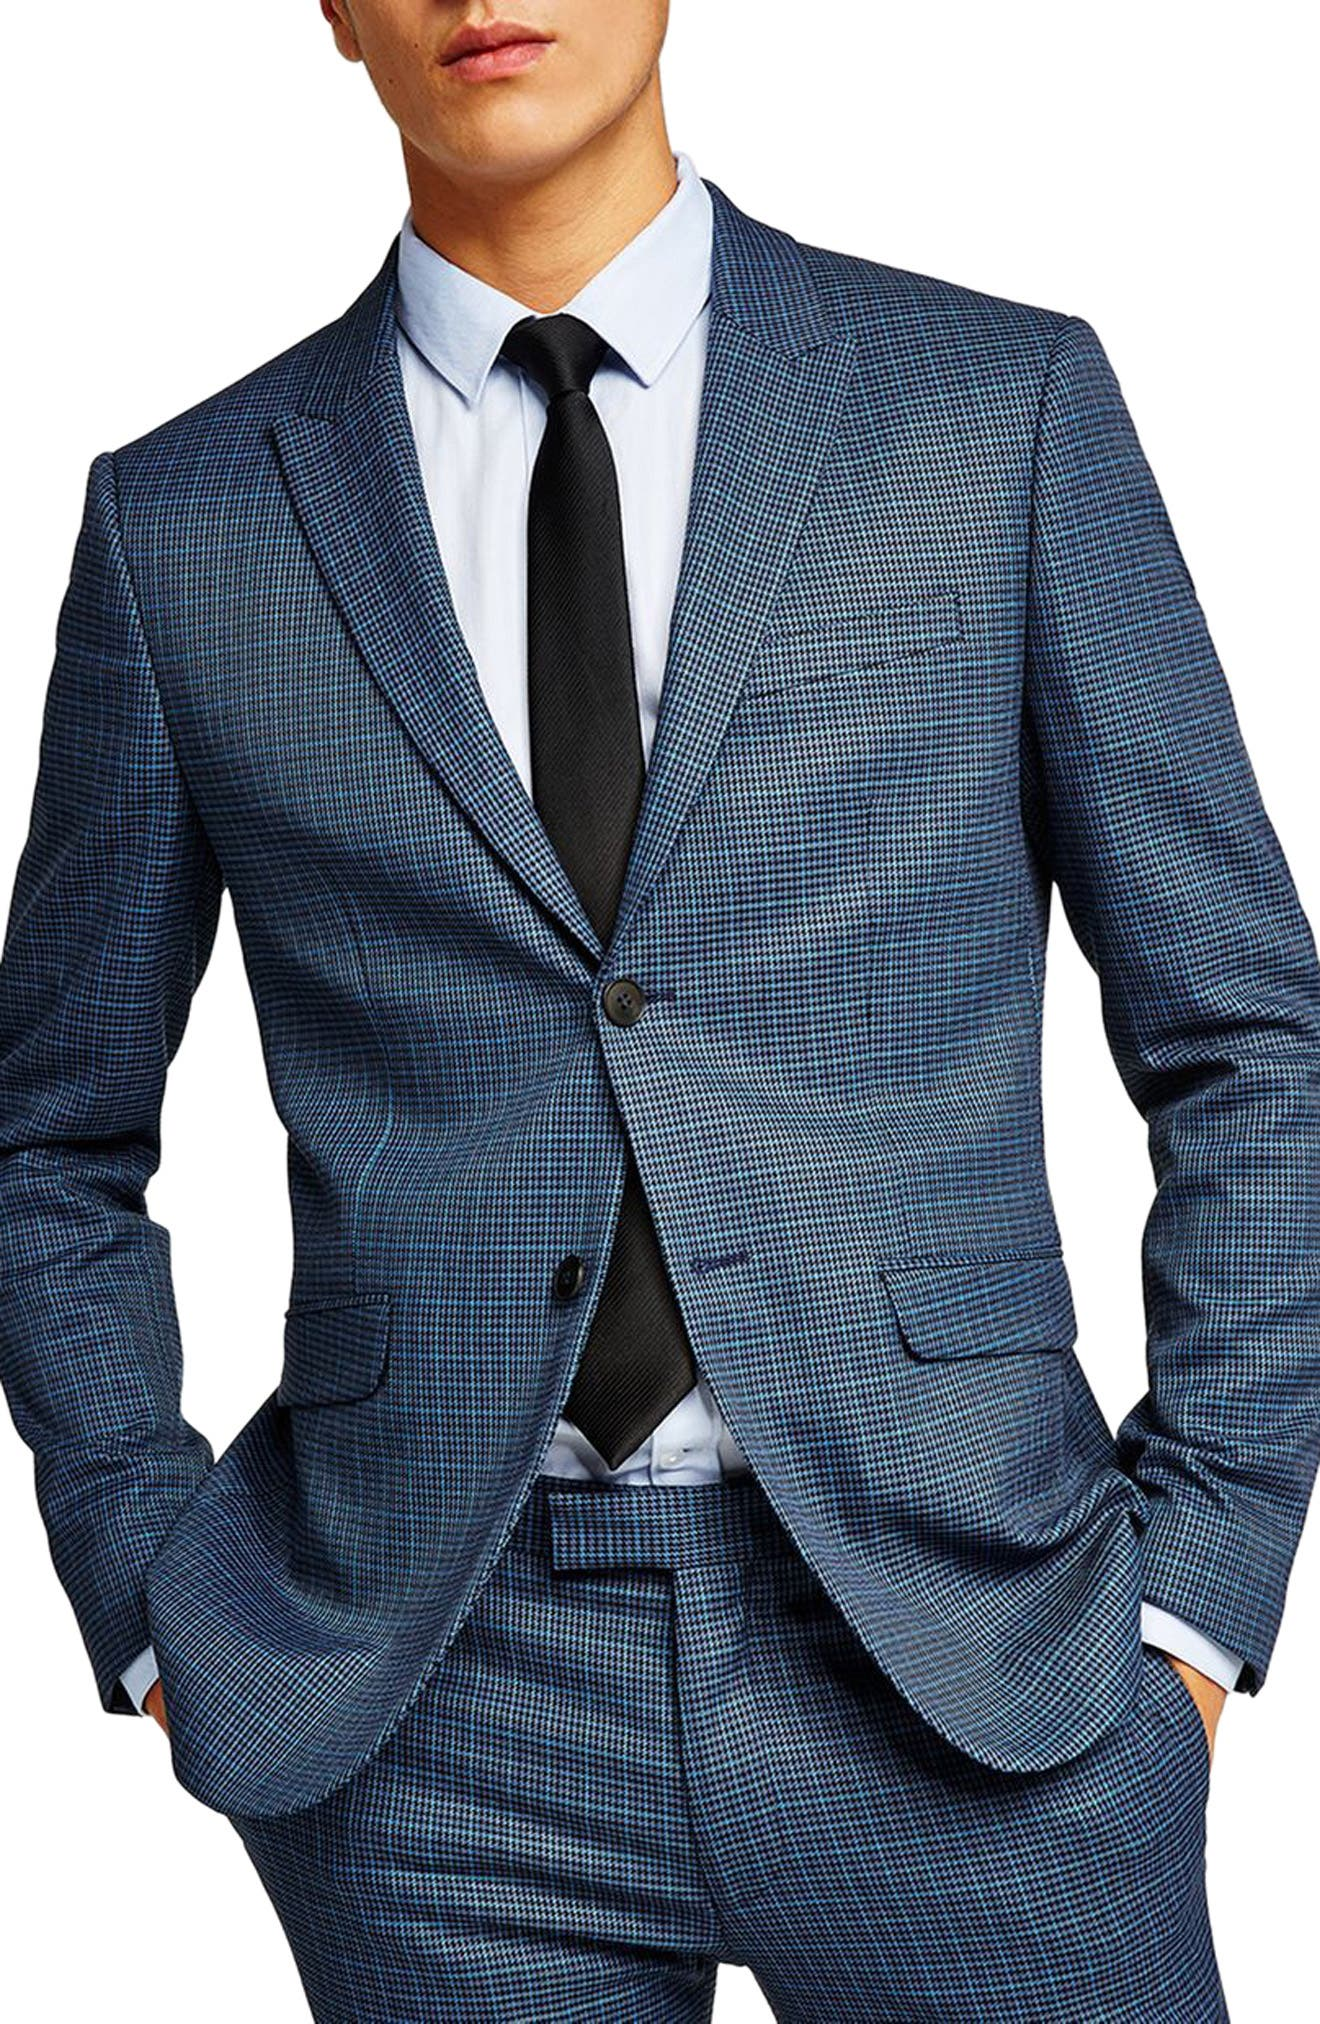 Main Image - Topman Check Skinny Fit Suit Jacket